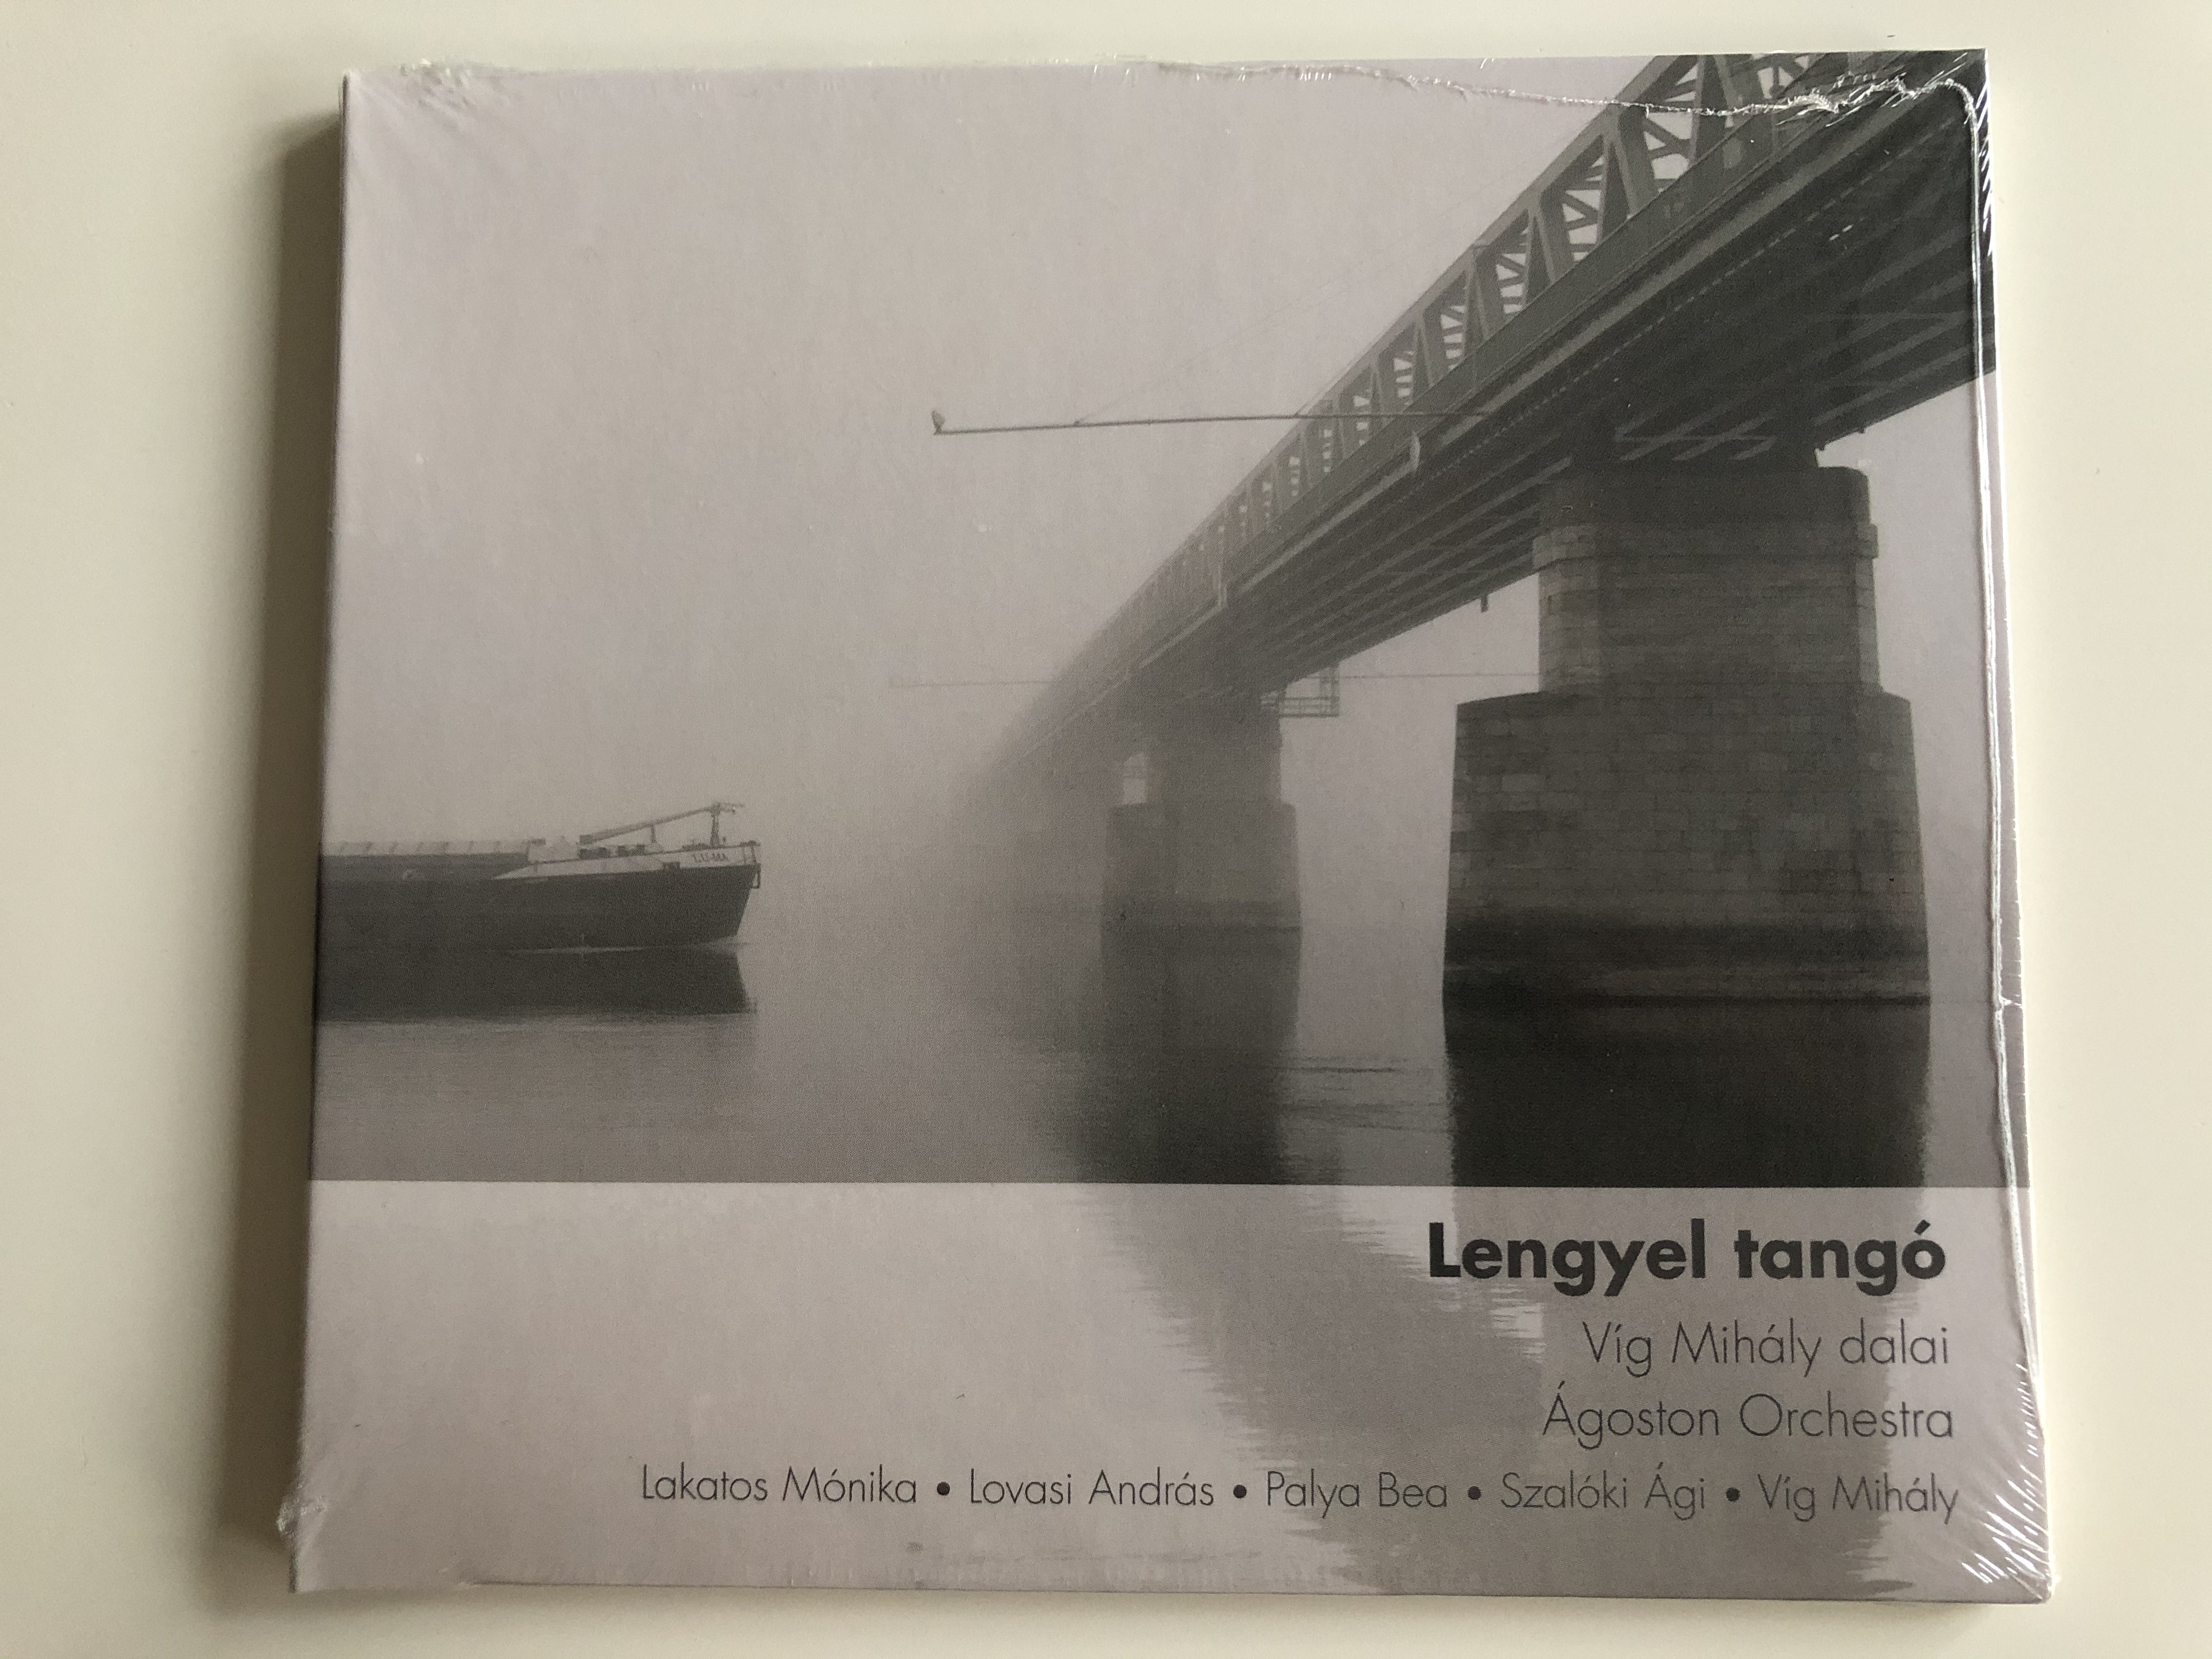 lengyel-tang-v-g-mih-ly-dalai-goston-orchestra-lakatos-monika-lovasi-andras-polya-bea-szaloki-agi-vig-mihaly-gryllus-audio-cd-2014-gcd-136-1-.jpg